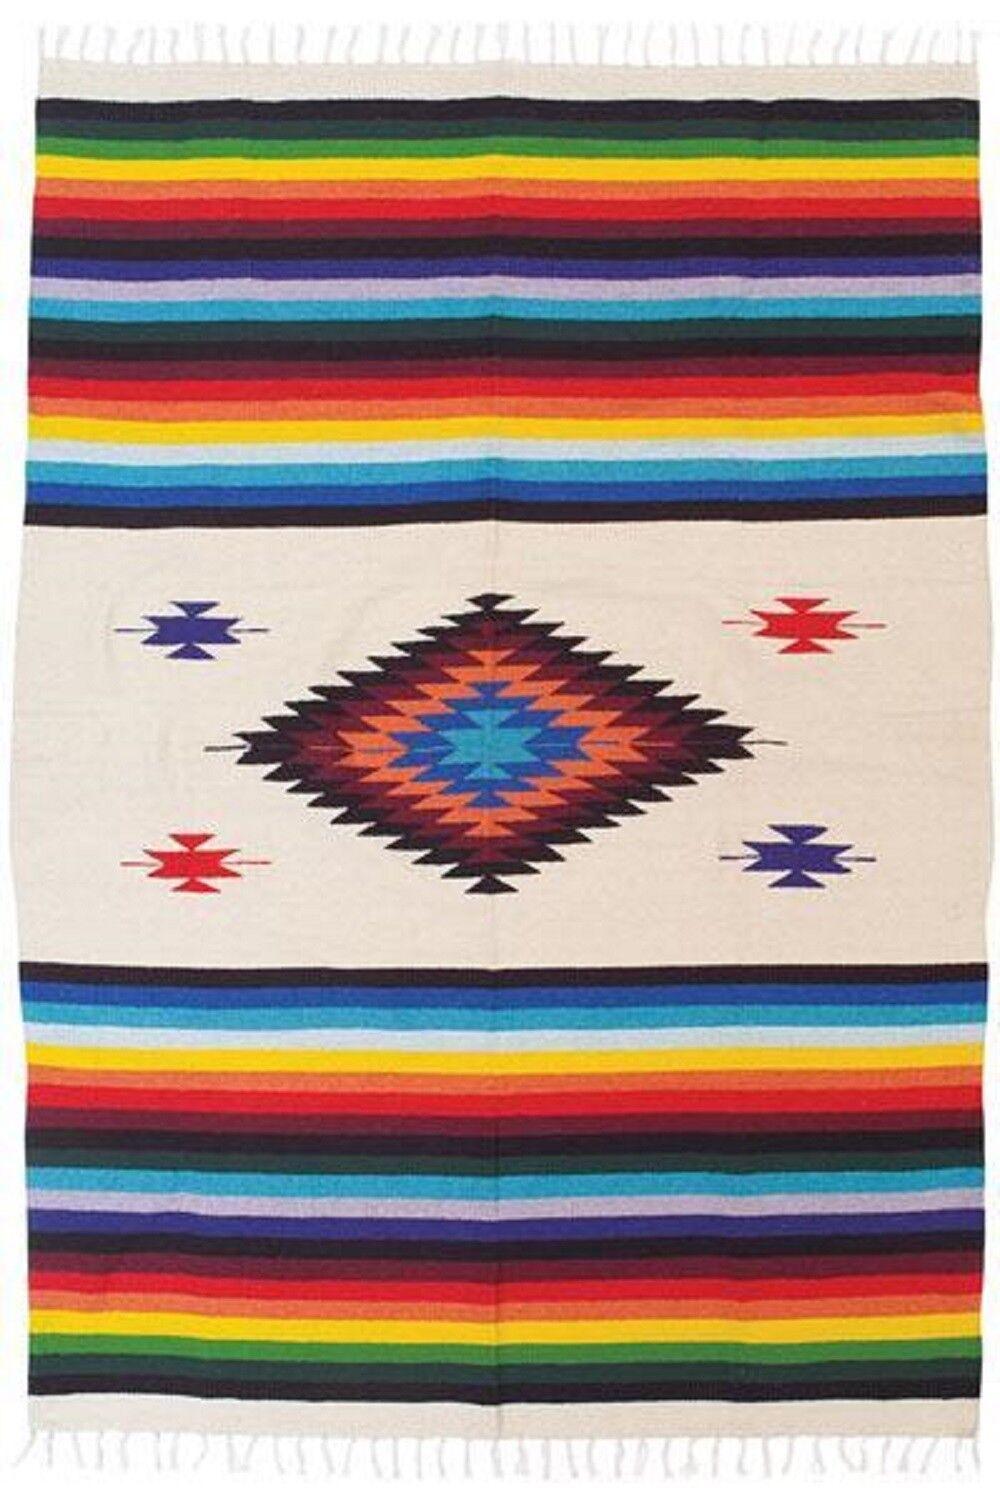 Diamond Sarape Throw Bed Cover Tan Mexico Beach Yoga Mat Travel Camp 5'x7' Cotto